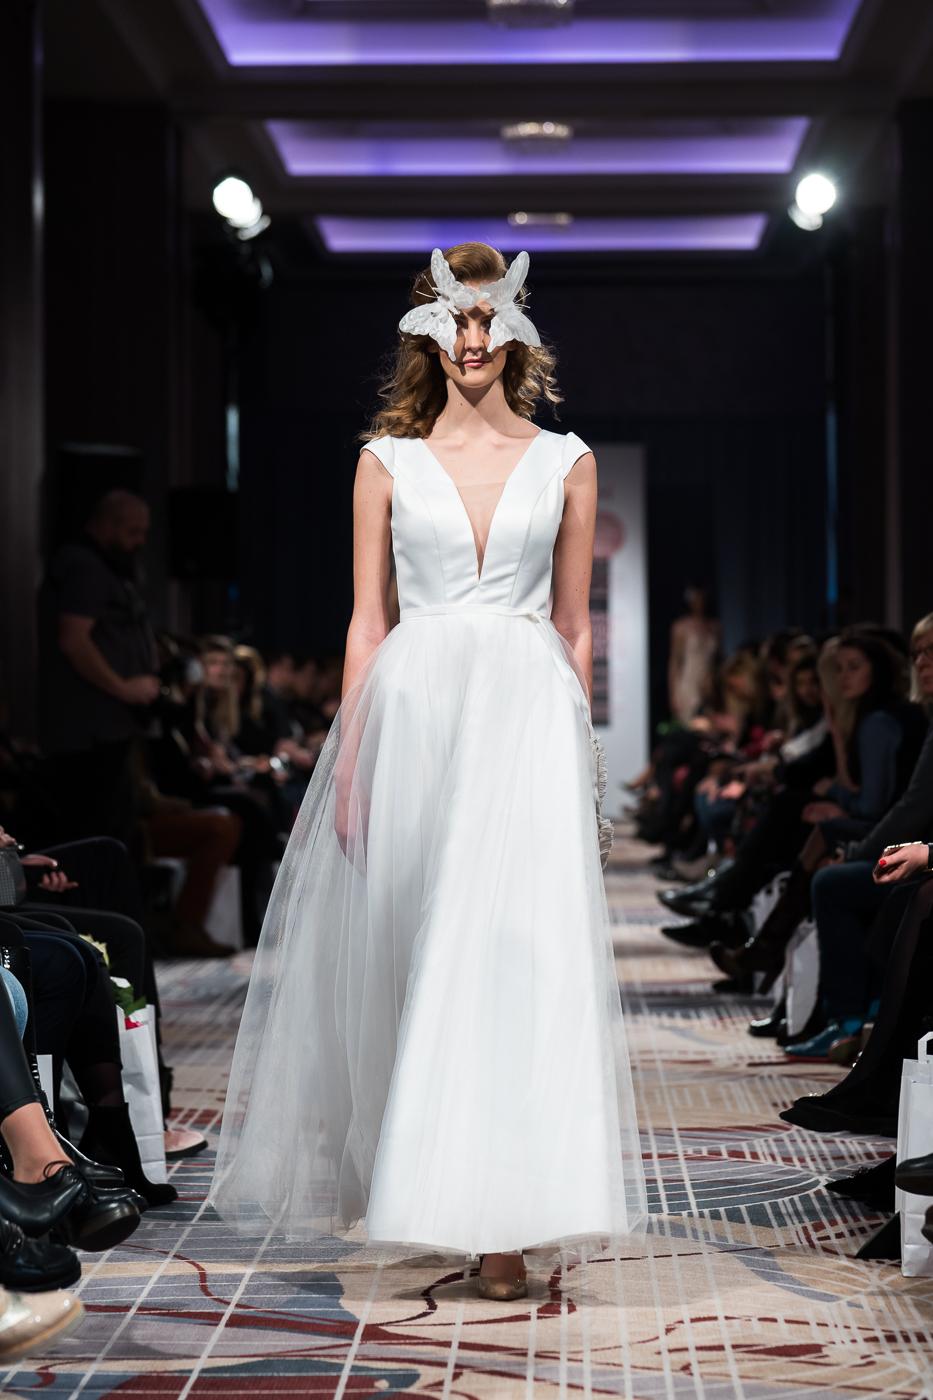 Amelia-wedding-dresses-141